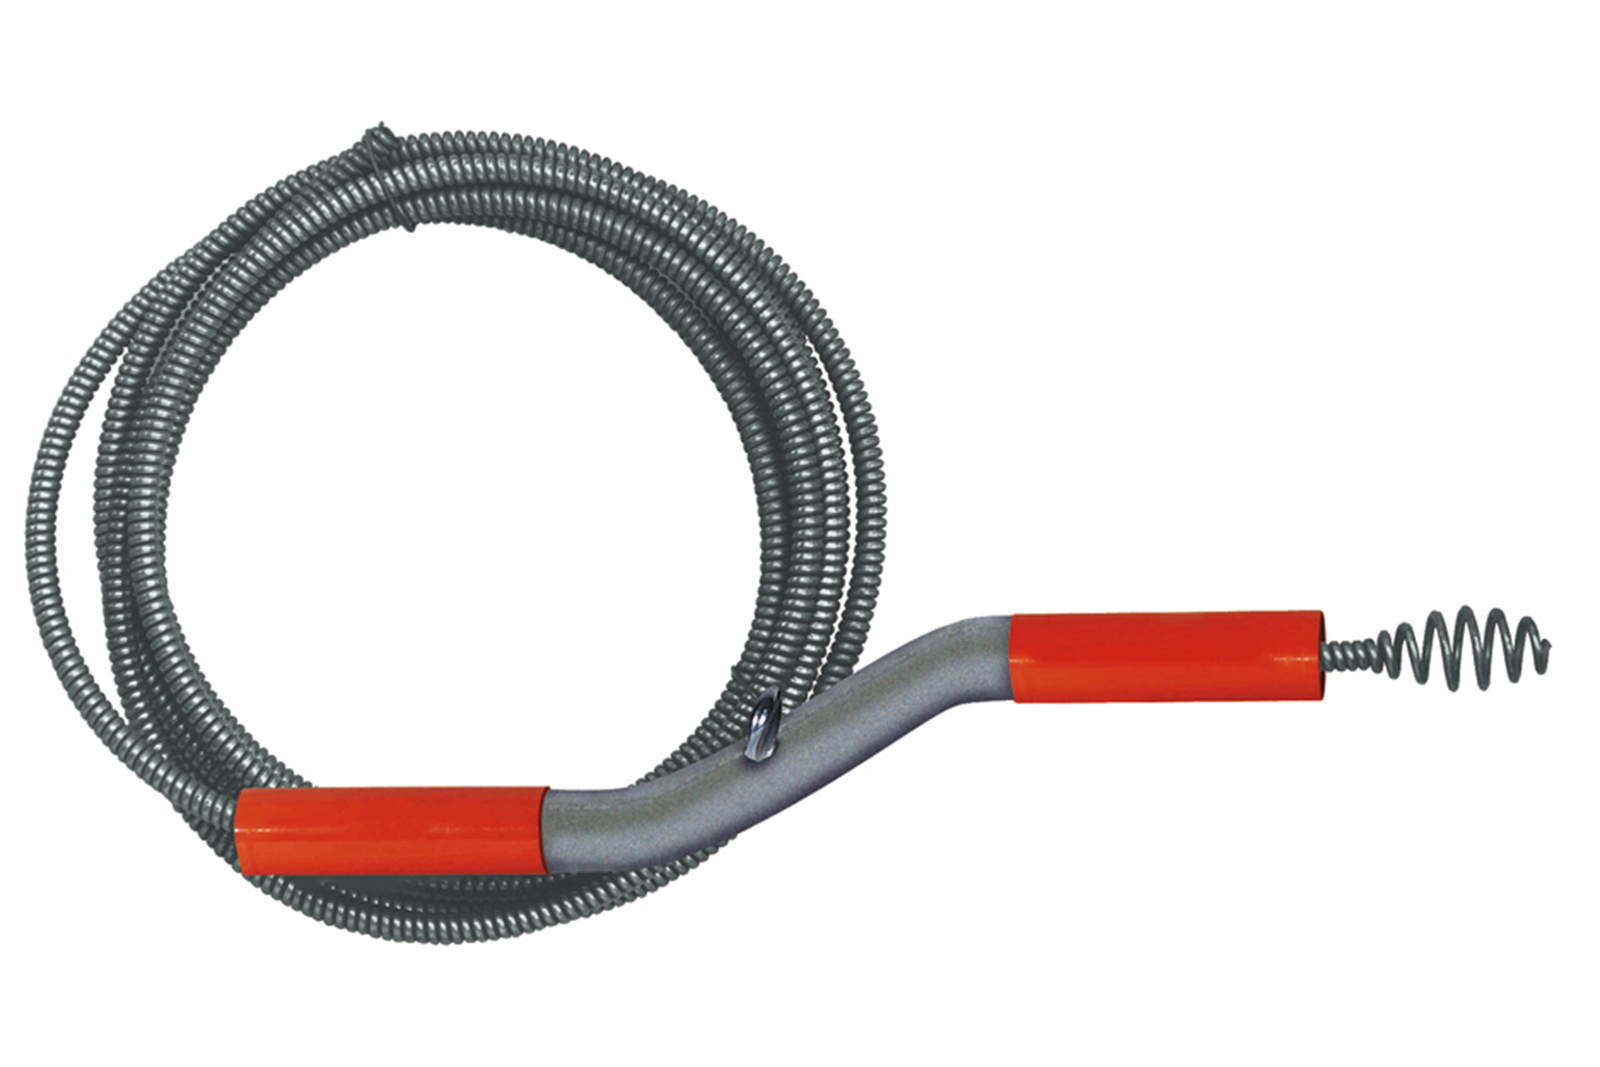 Купить Трос для прочистки General pipe Flexicore 25fl1